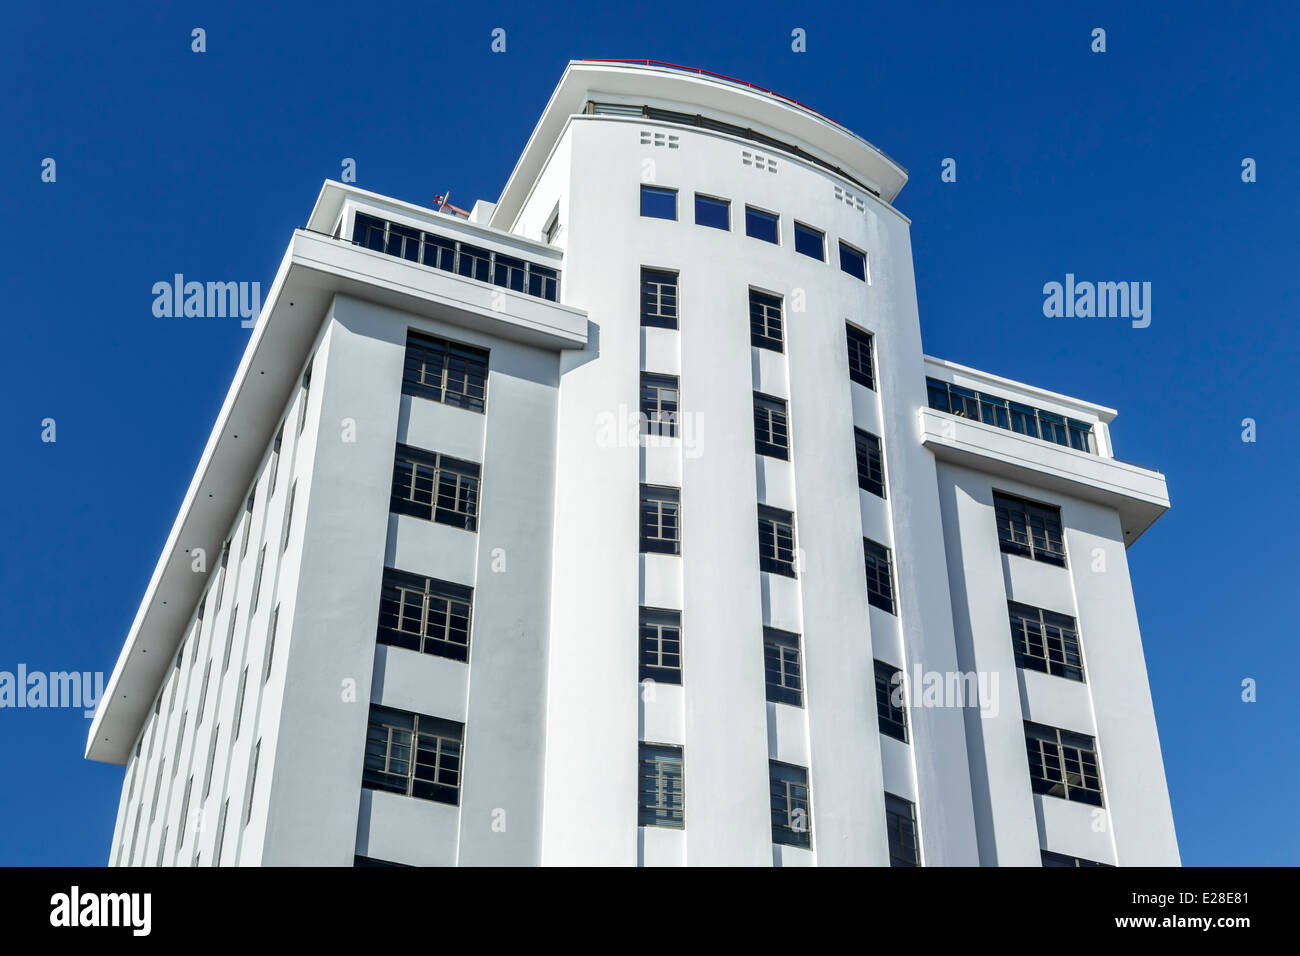 Banco Popular Building, Old San Juan, Puerto Rico - Stock Image